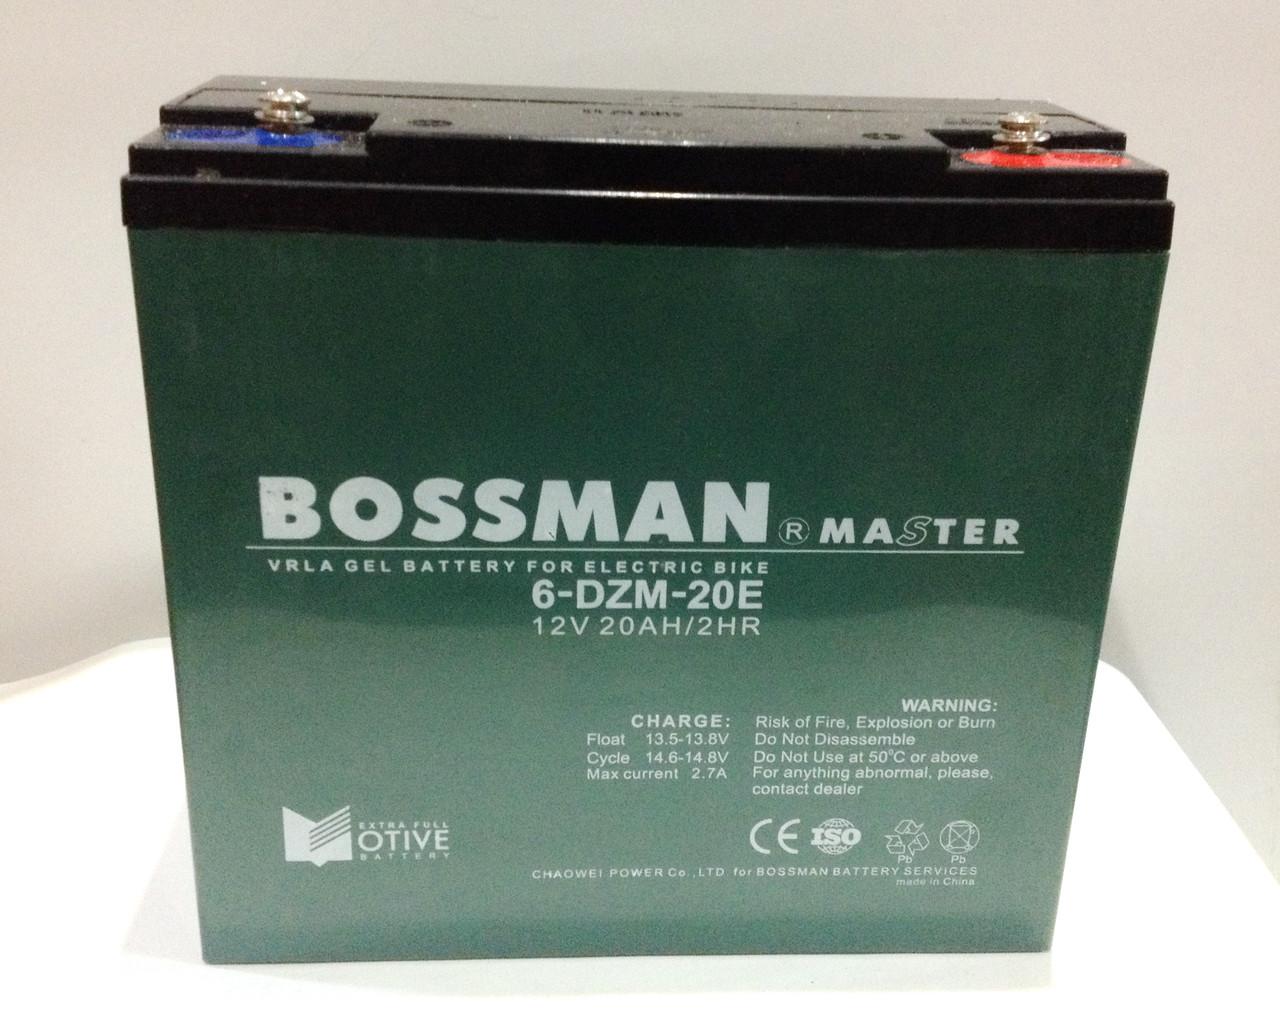 "Аккумулятор 12V 20Ah Bossman-Master 6DZM20  - Интернет-магазин ""NikMoto"" в Черкассах"